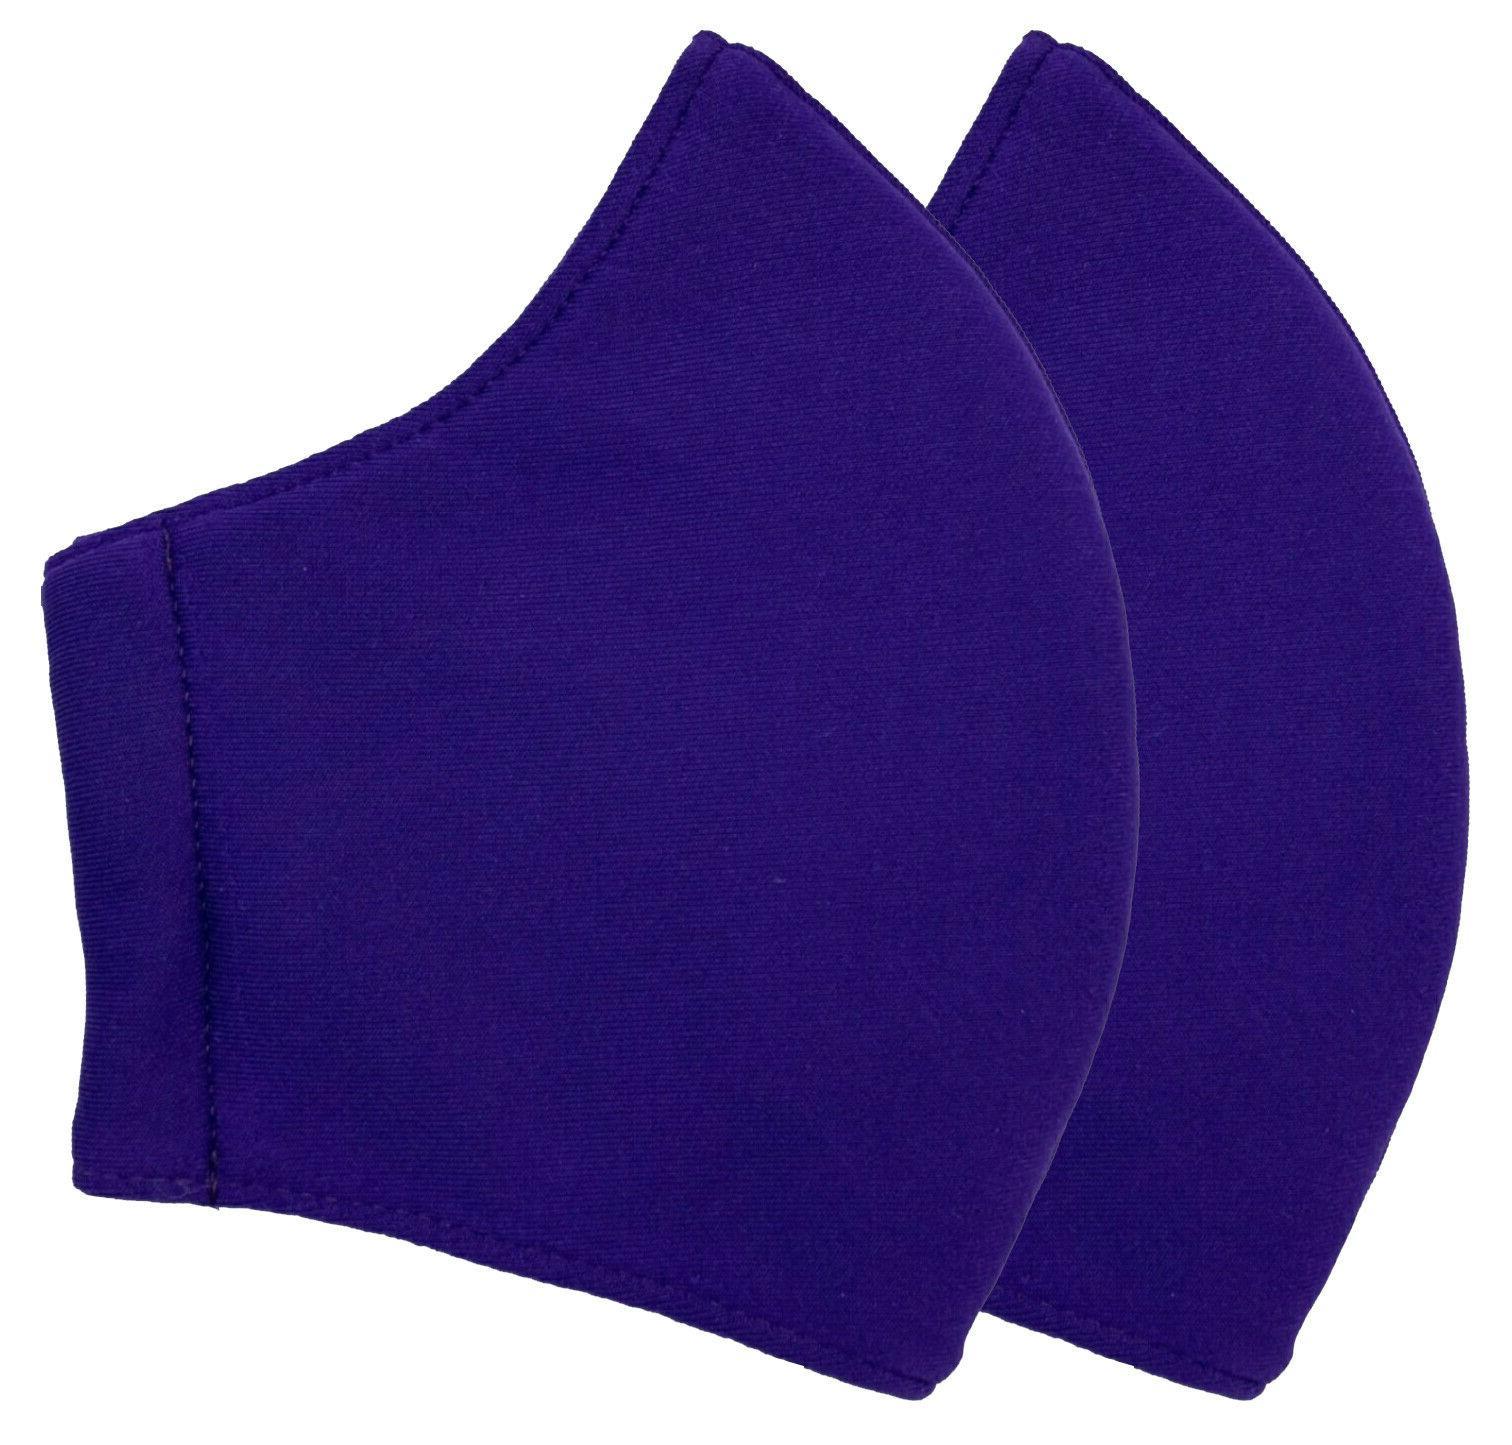 Triple Layers 2 Face Mask Polyester/Cotton Reusable Unisex MultiColor